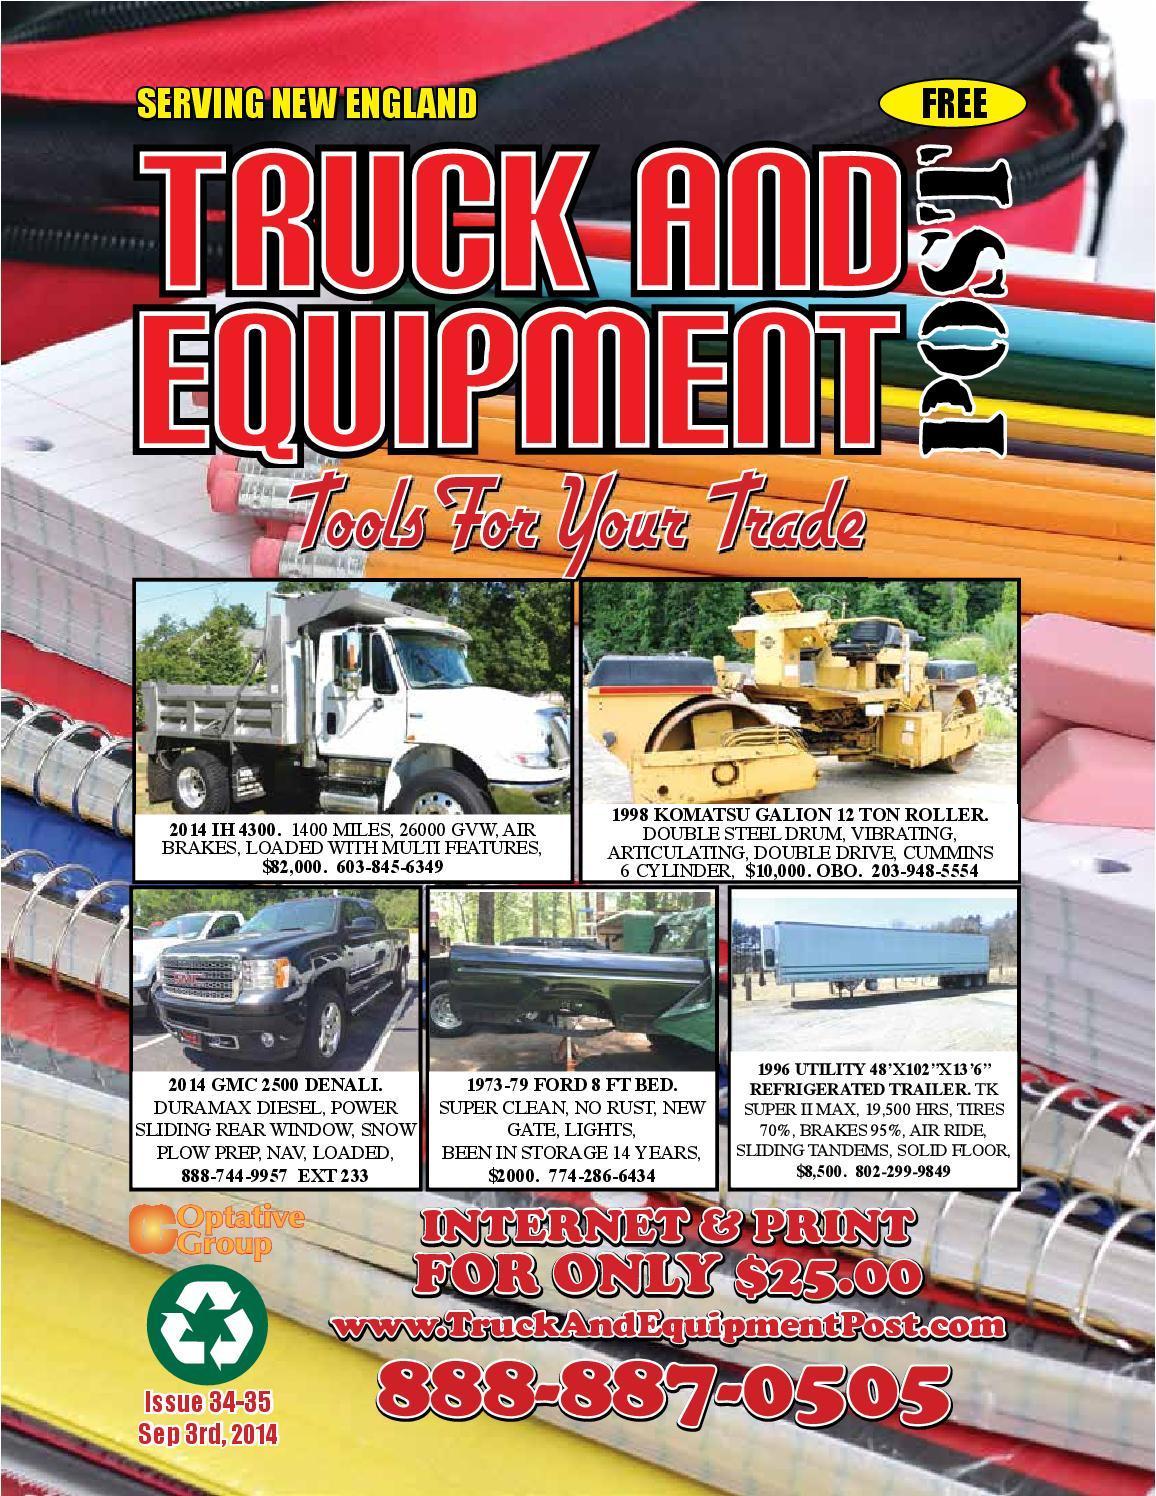 hight resolution of wiring hyundai i10 2014 international 4300 truck international truck equipment post 34 35 2014 by 1clickaway